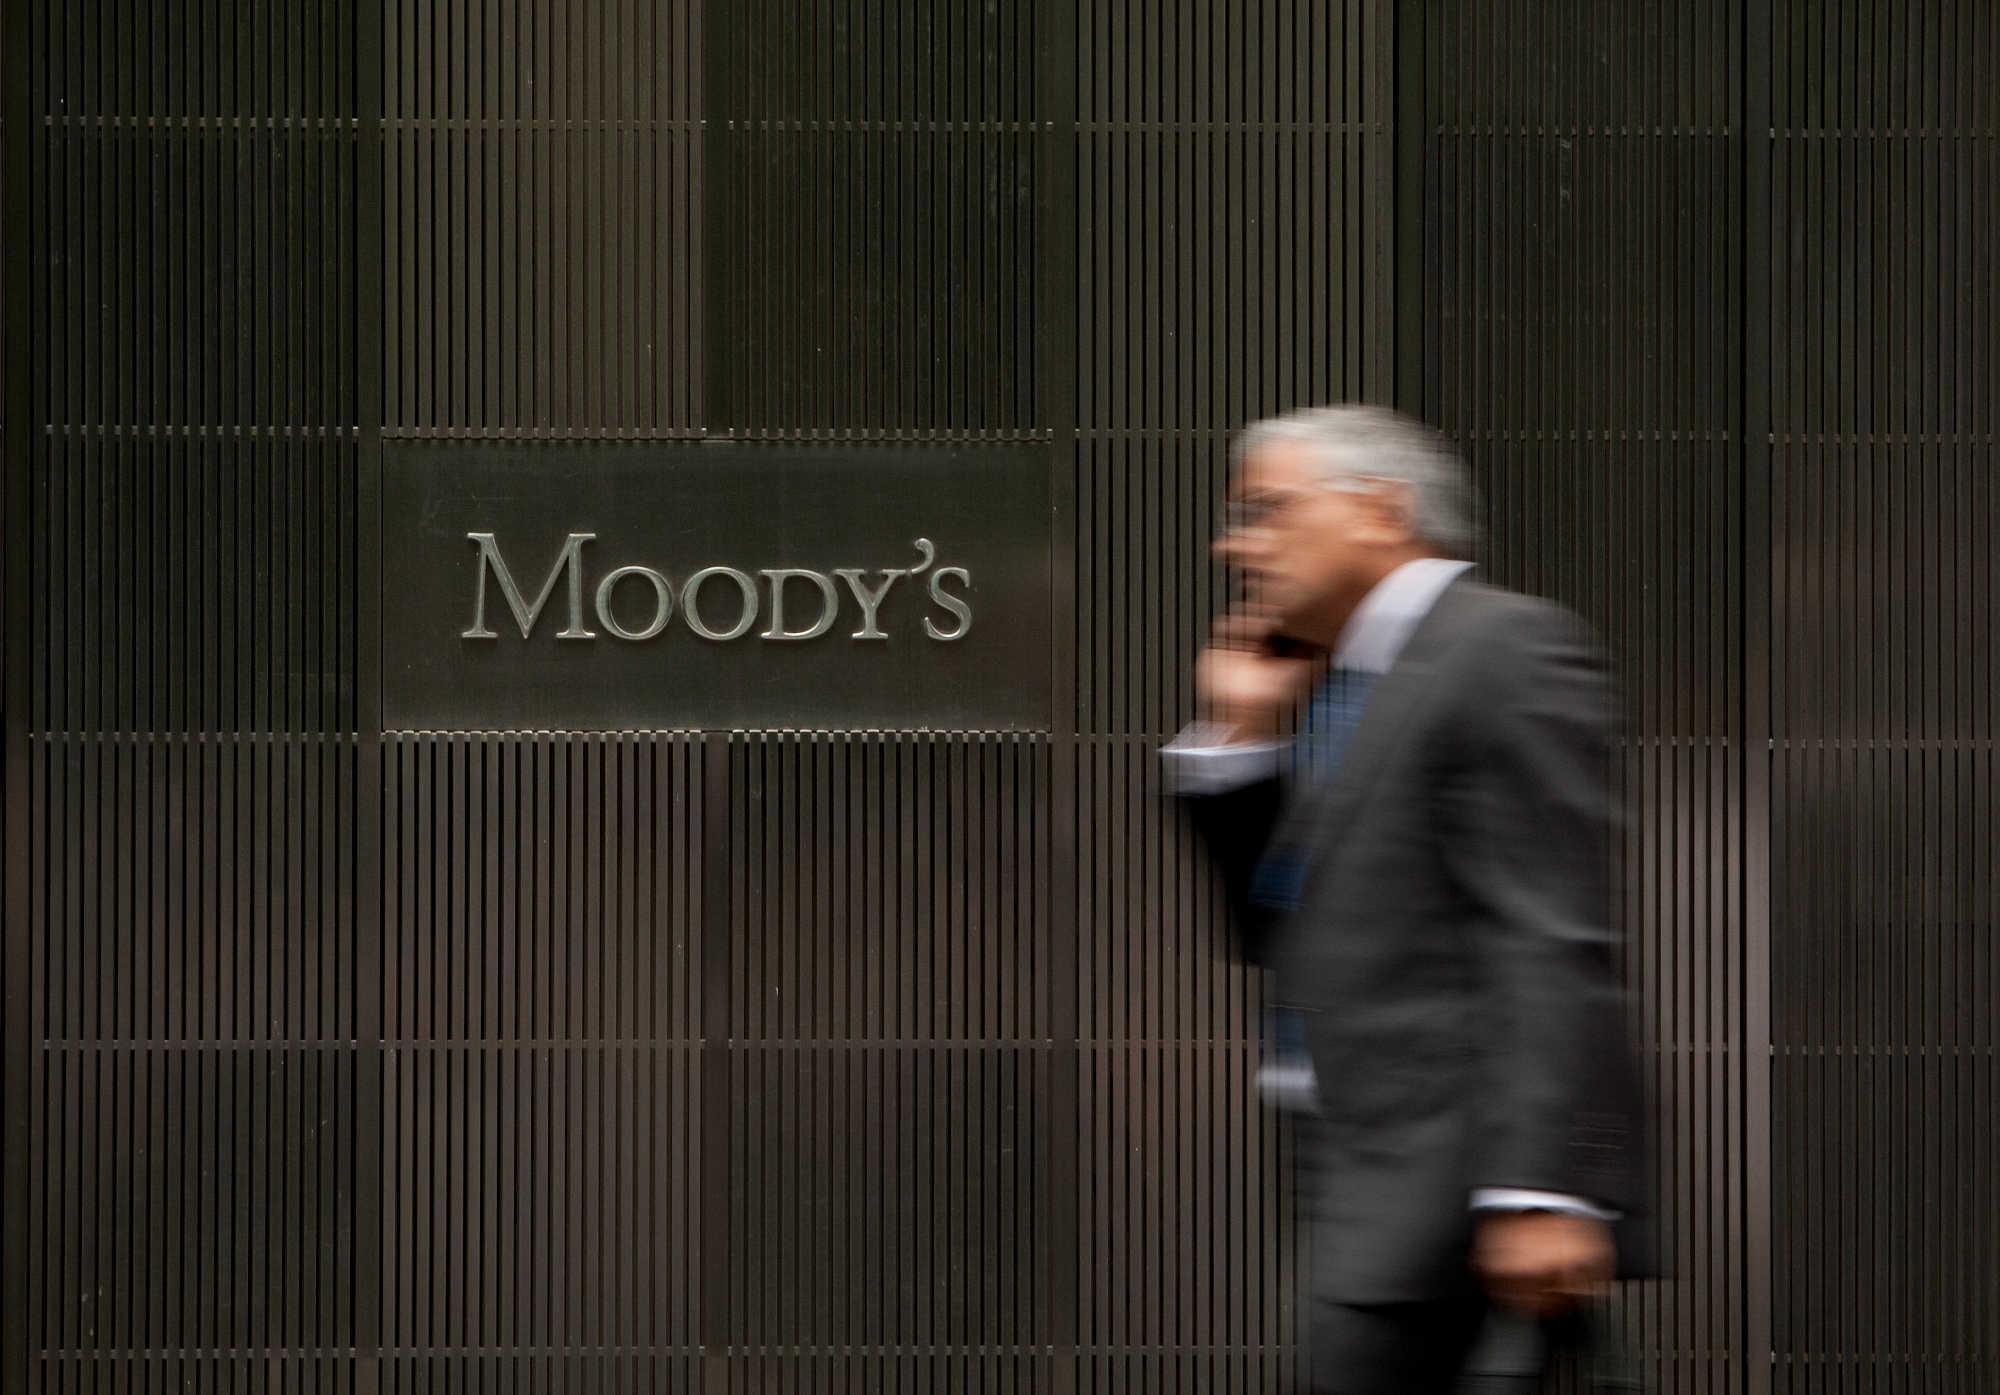 Moody's: Καμπανάκι για χρέος, εύσημα για μεταρρυθμίσεις